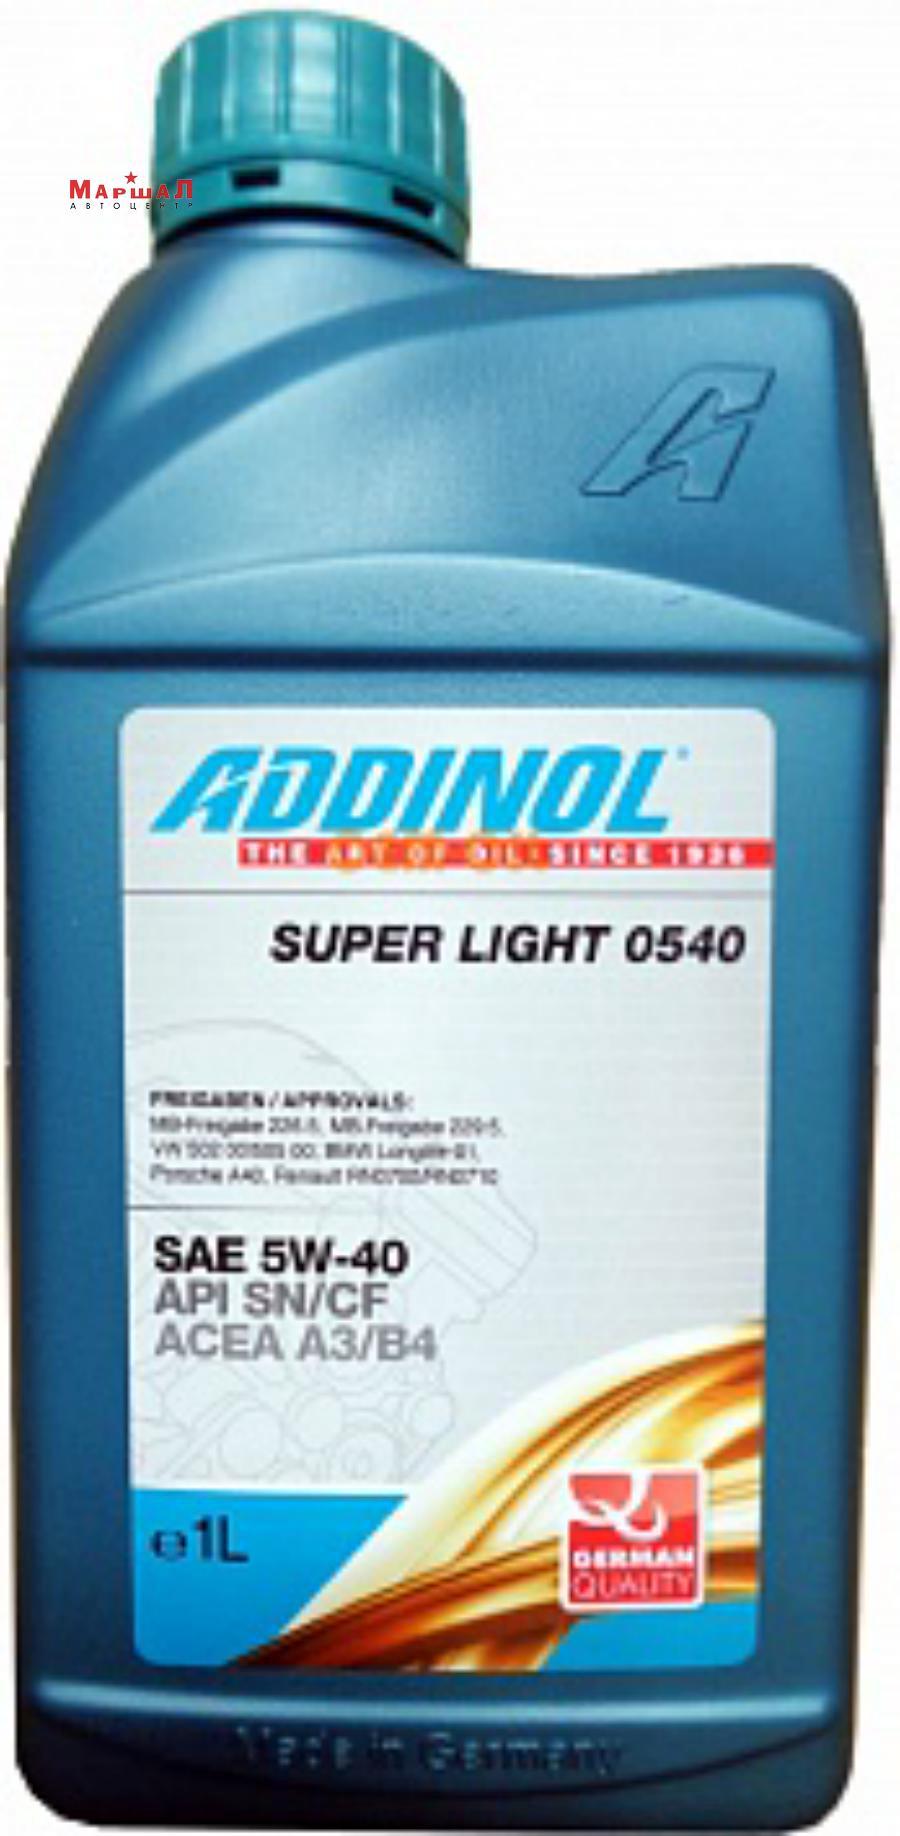 Масло моторное синтетическое Super Light 0540 5W-40, 1л